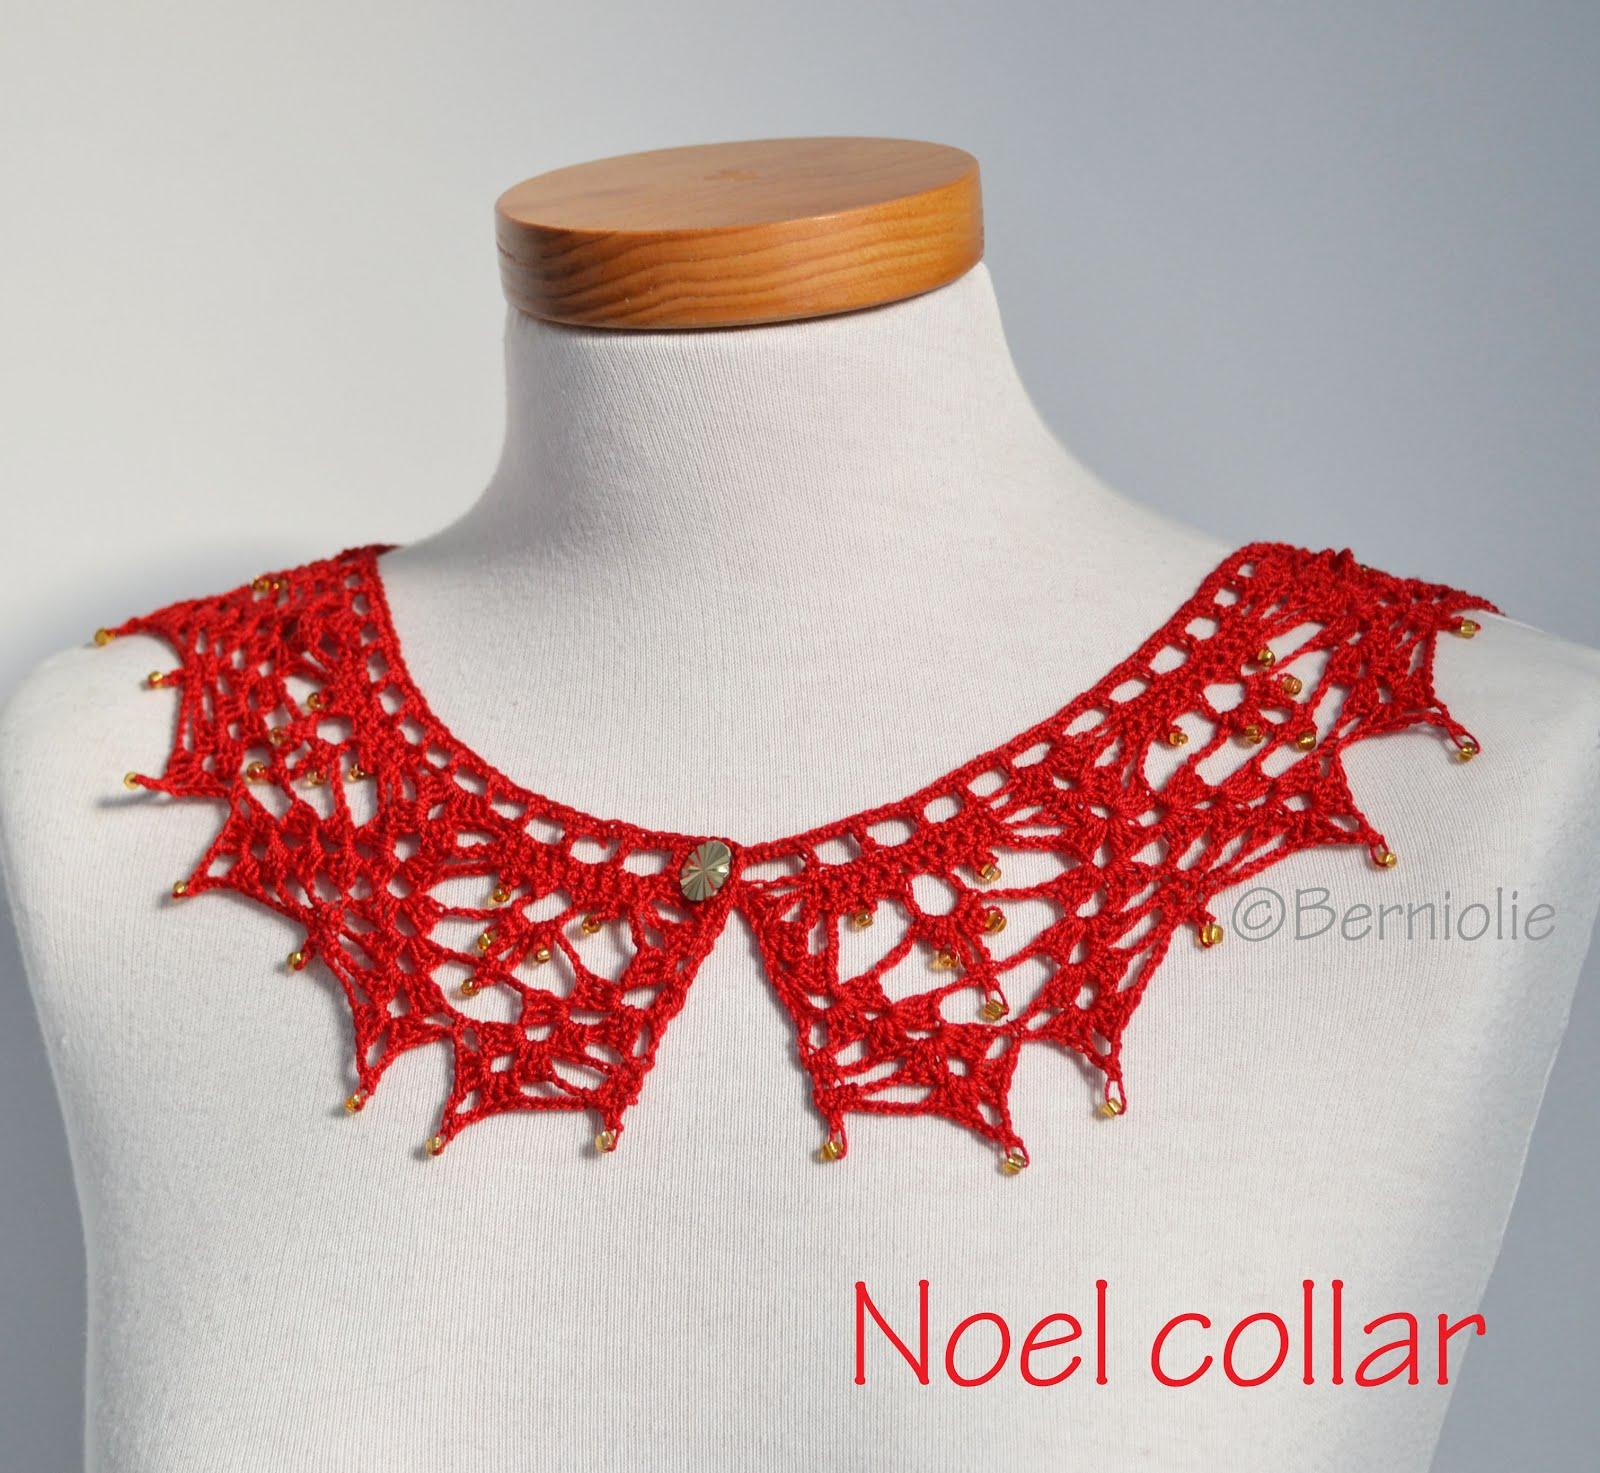 Noel collar